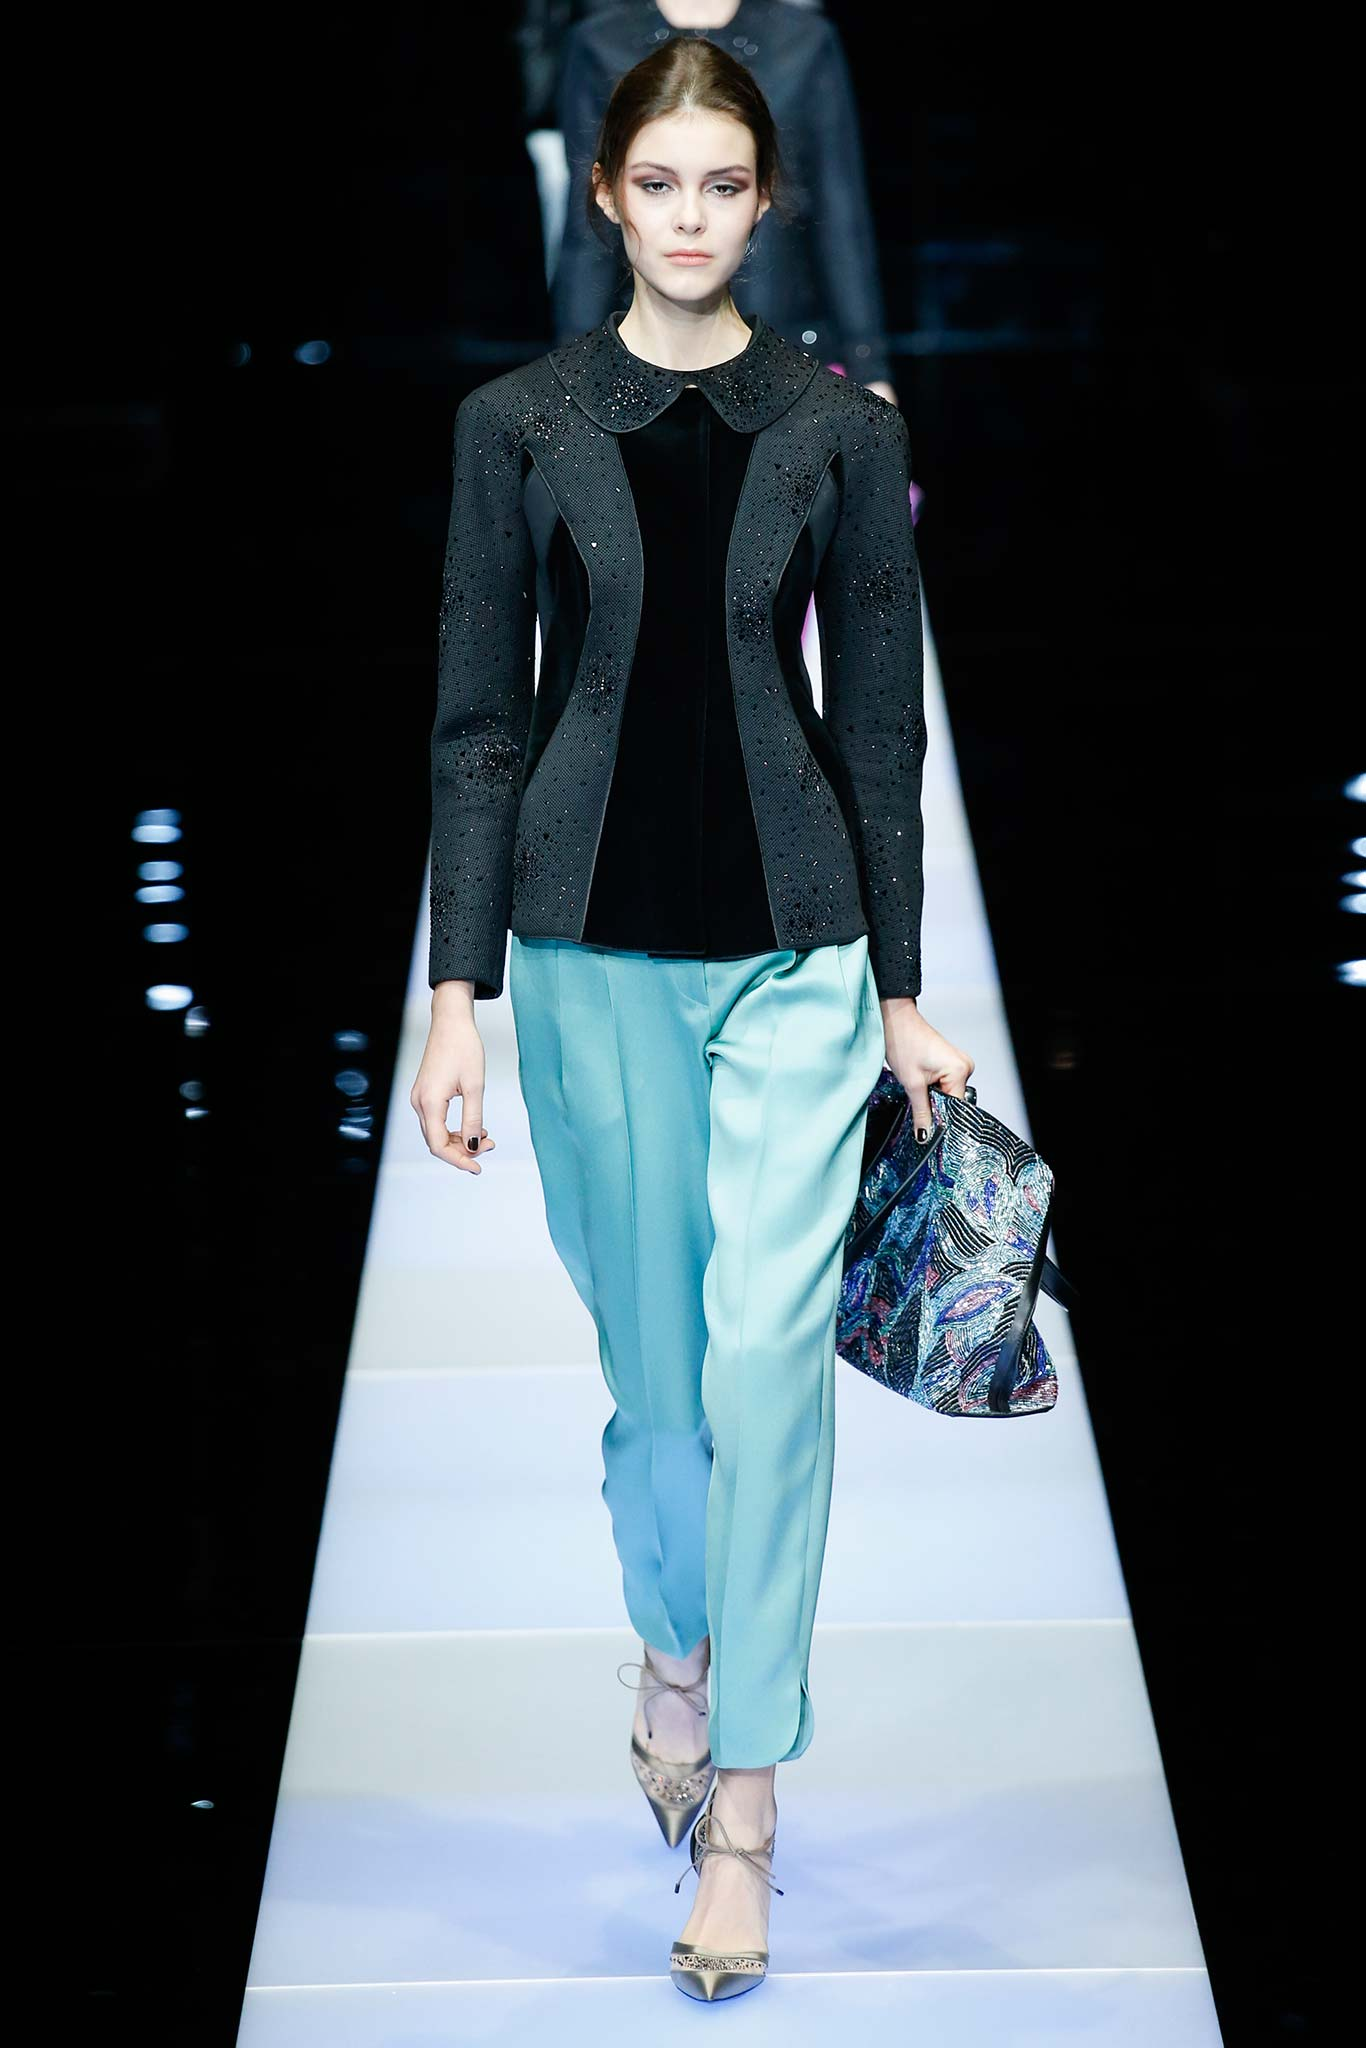 giorgio armani models - photo #26